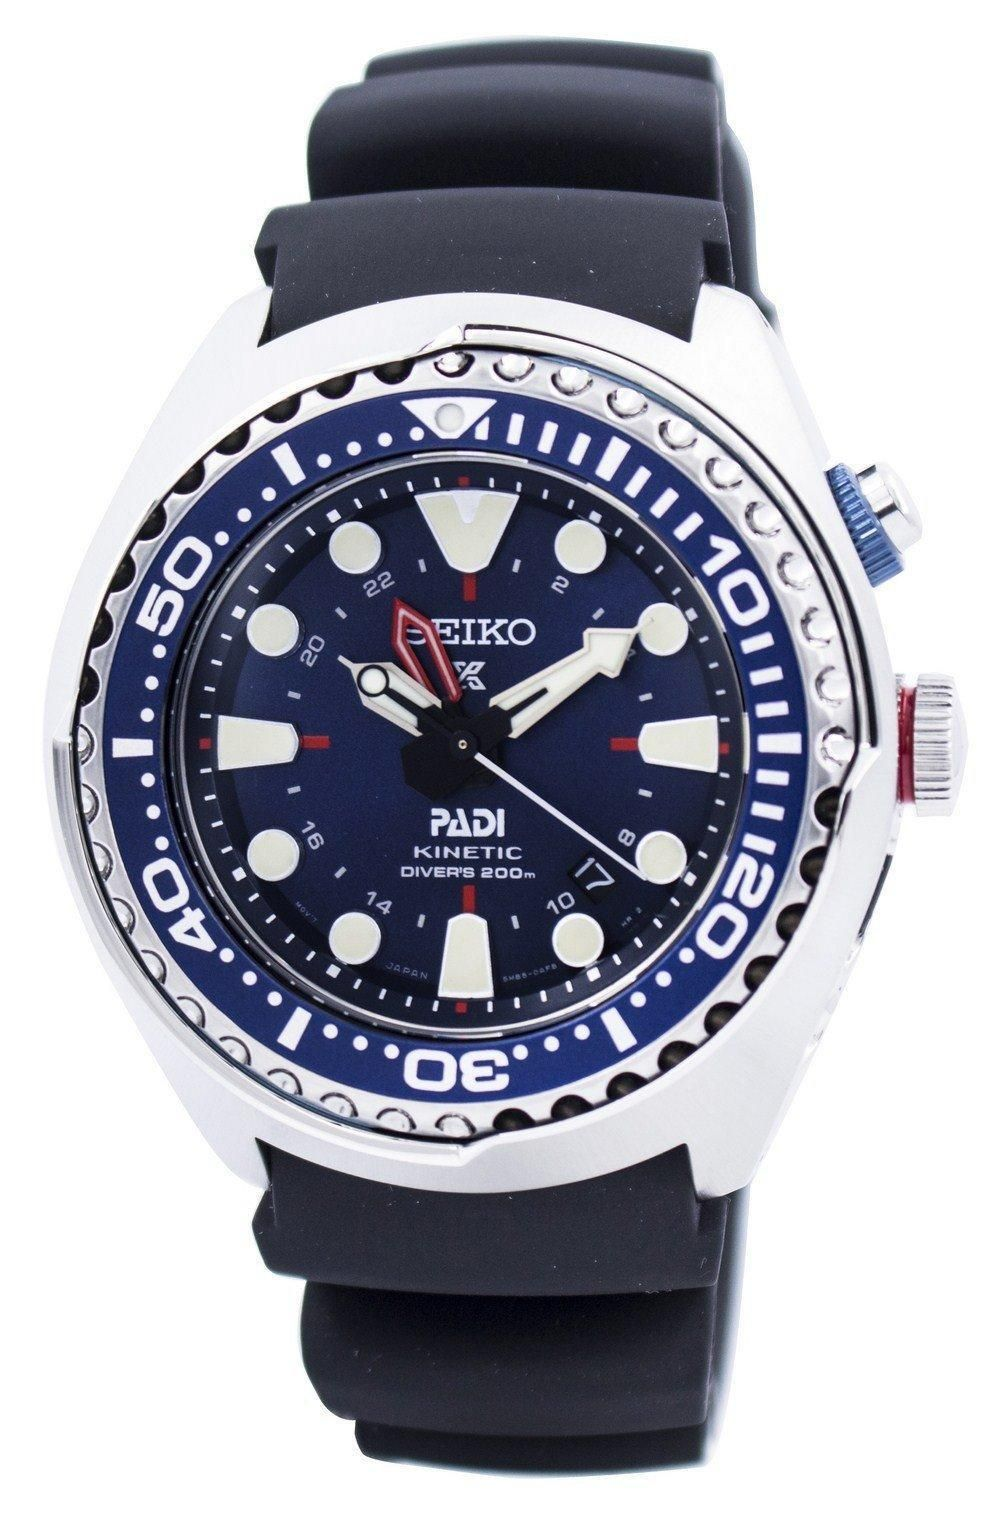 a41cf3301 Seiko Prospex Kinetic Gmt Diver's